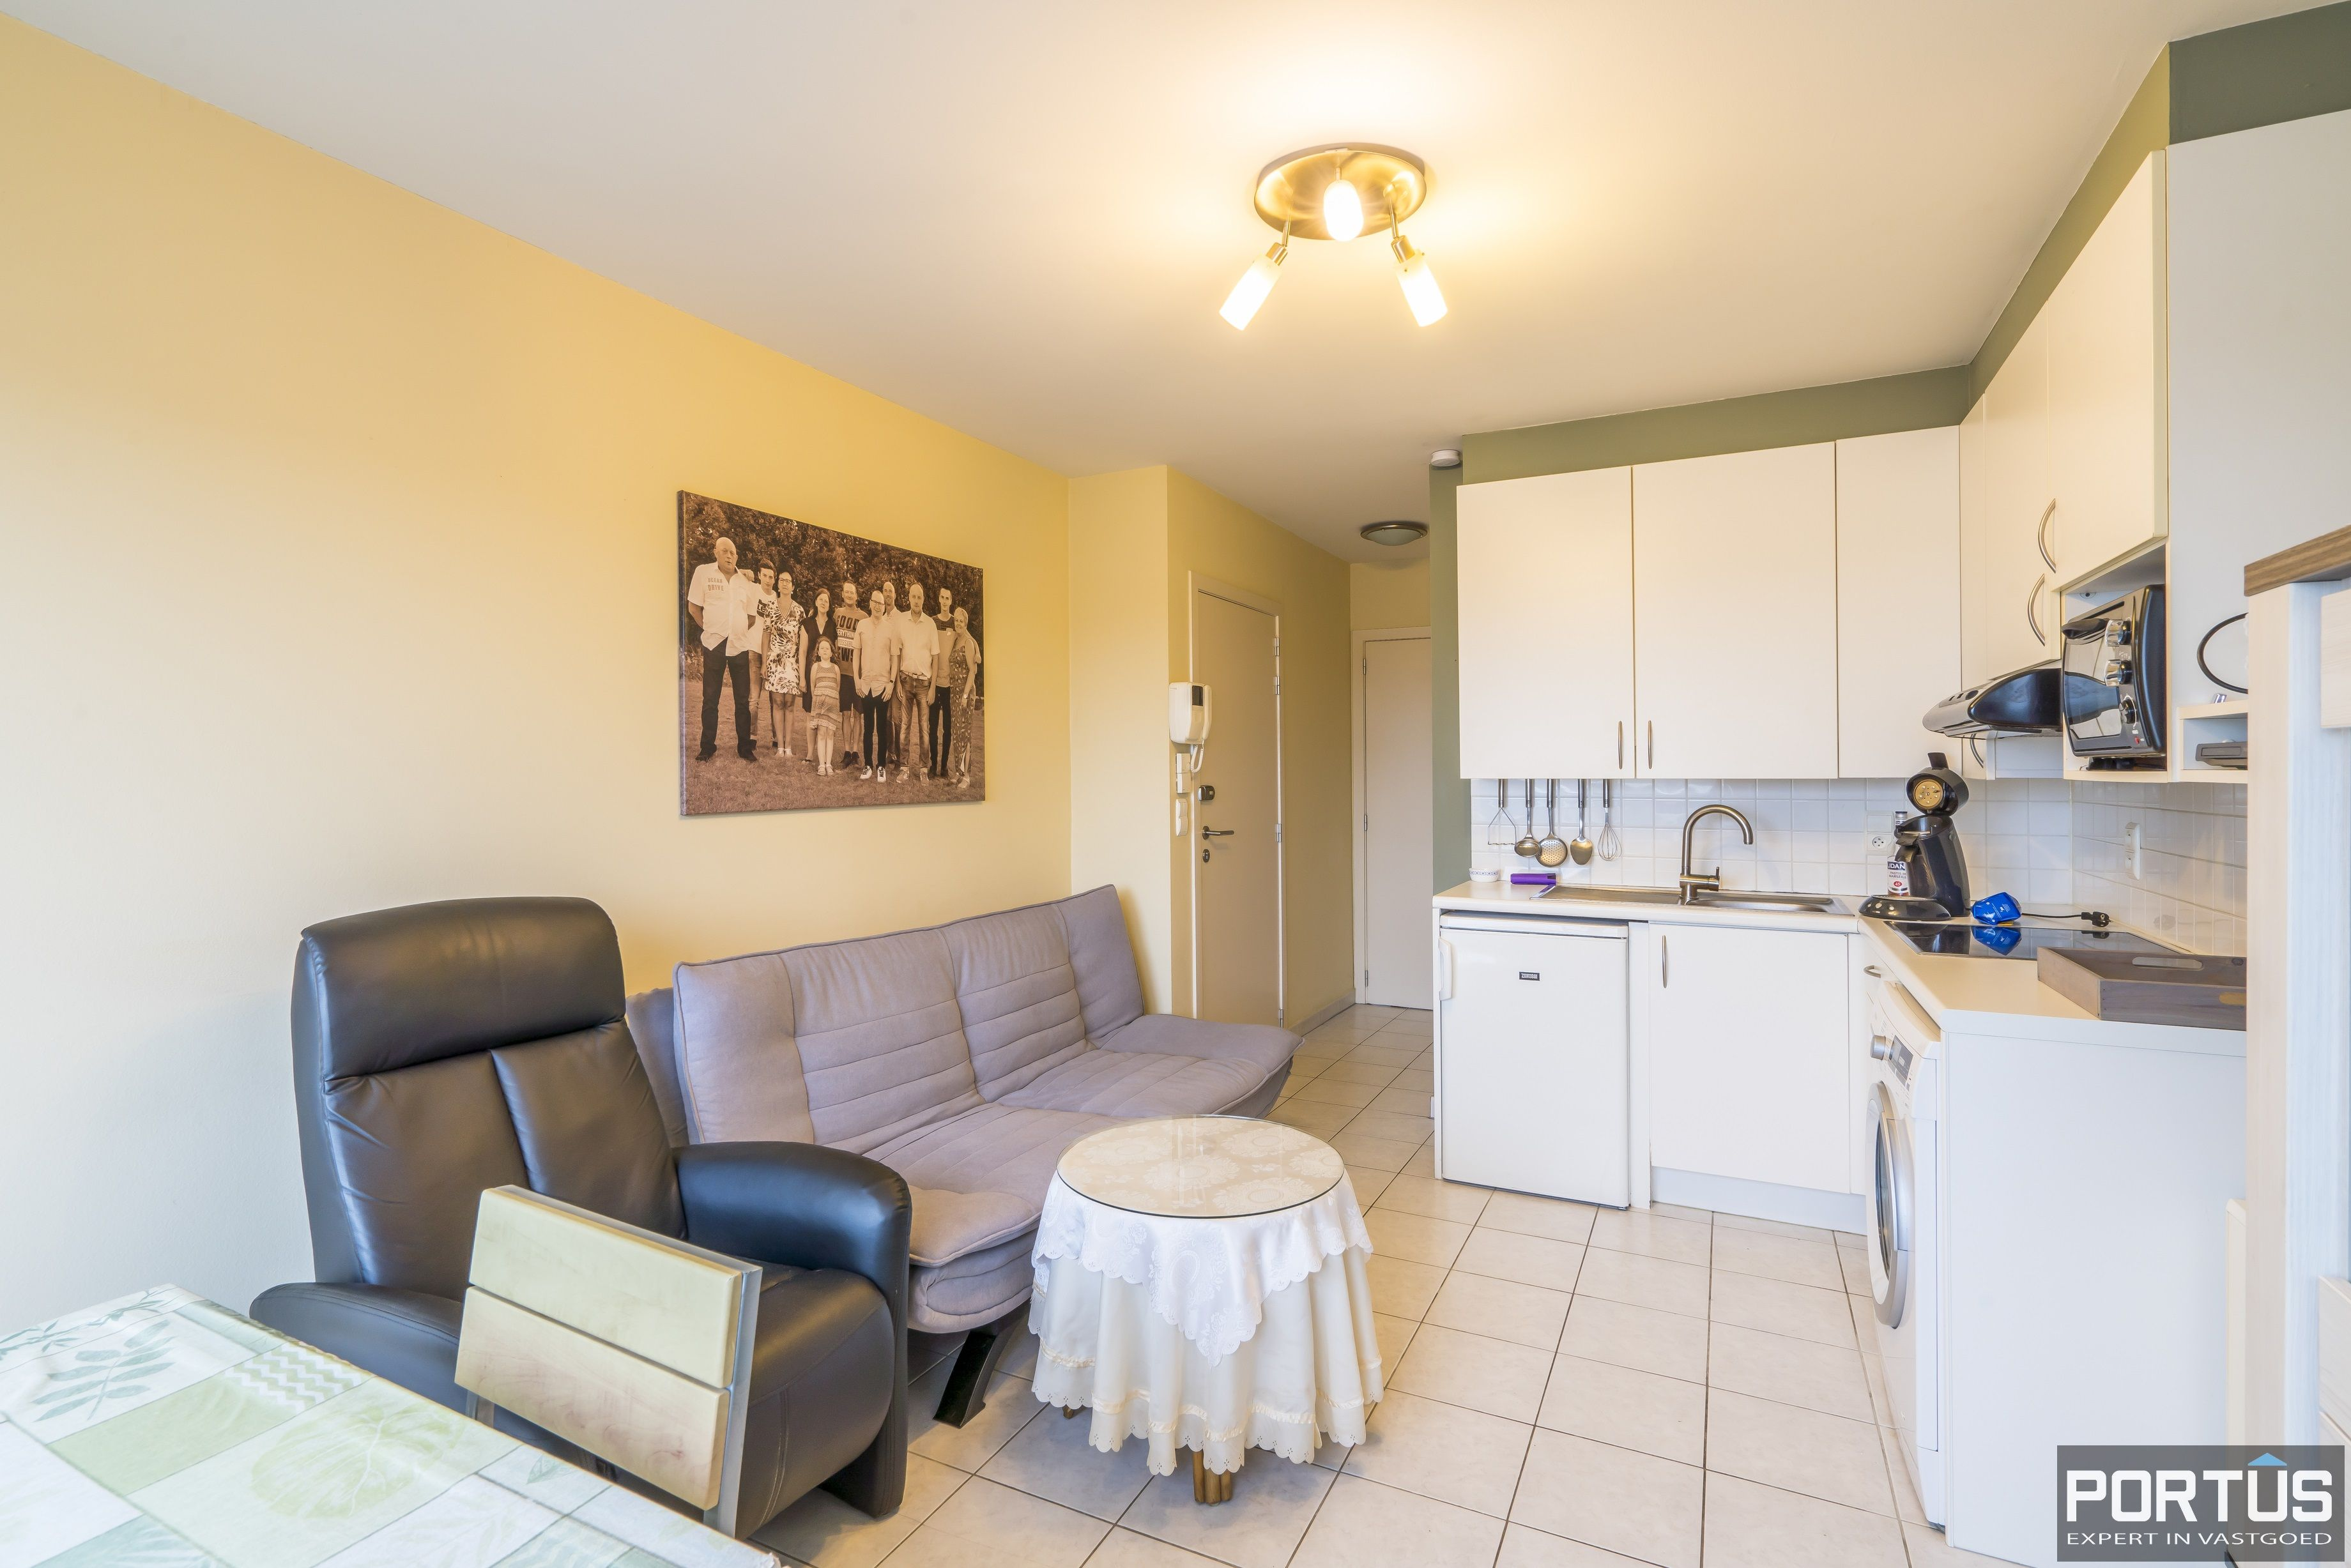 Instapklaar appartement met 1 slaapkamer te koop te Westende - 12056